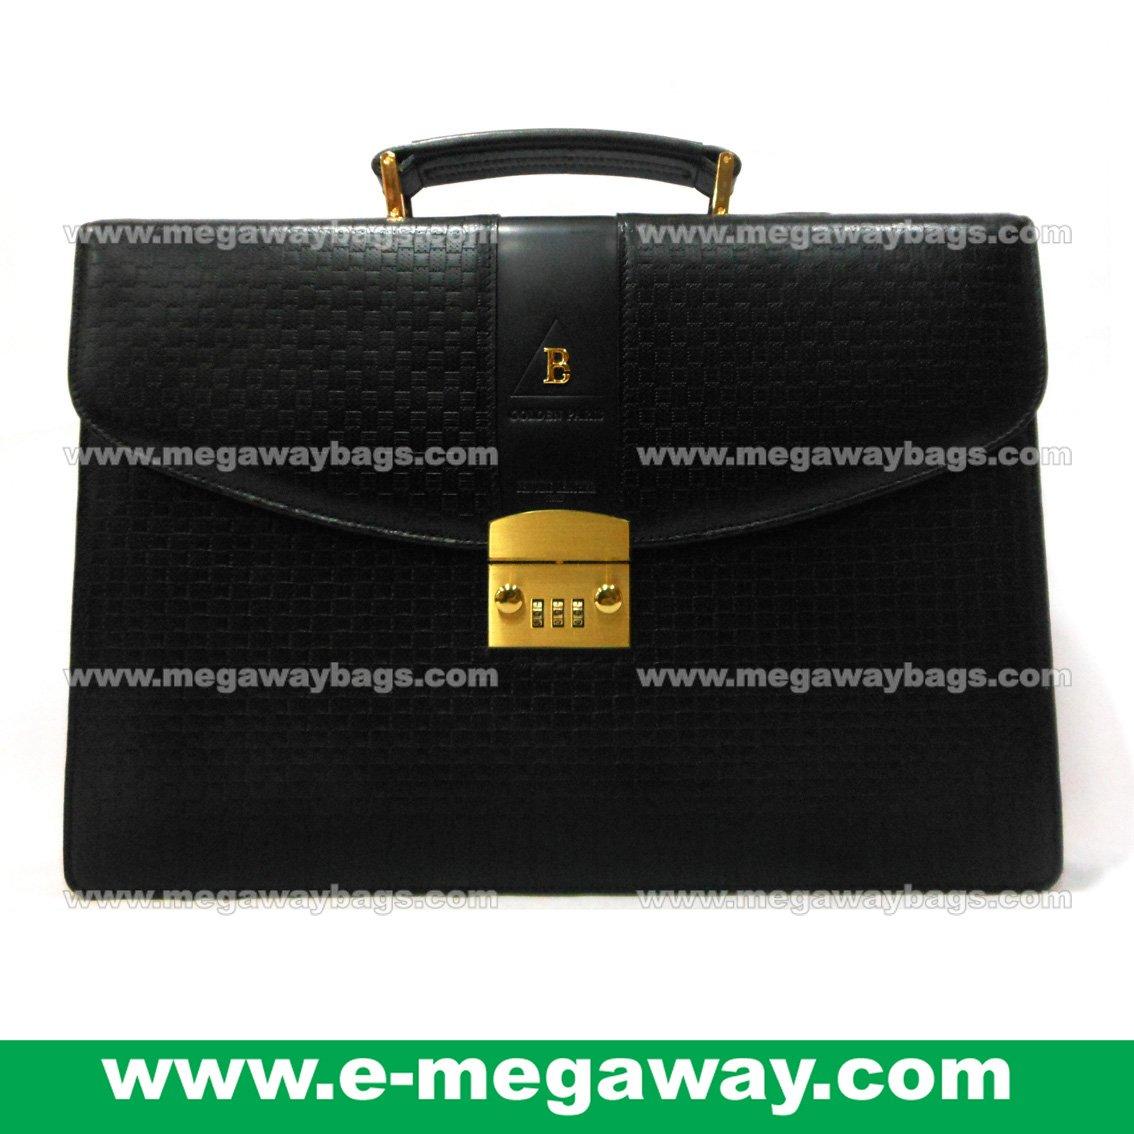 Executive Leather Briefcase Binders Key Lock Portfolios Case Organizer MegawayBags #CC-0941